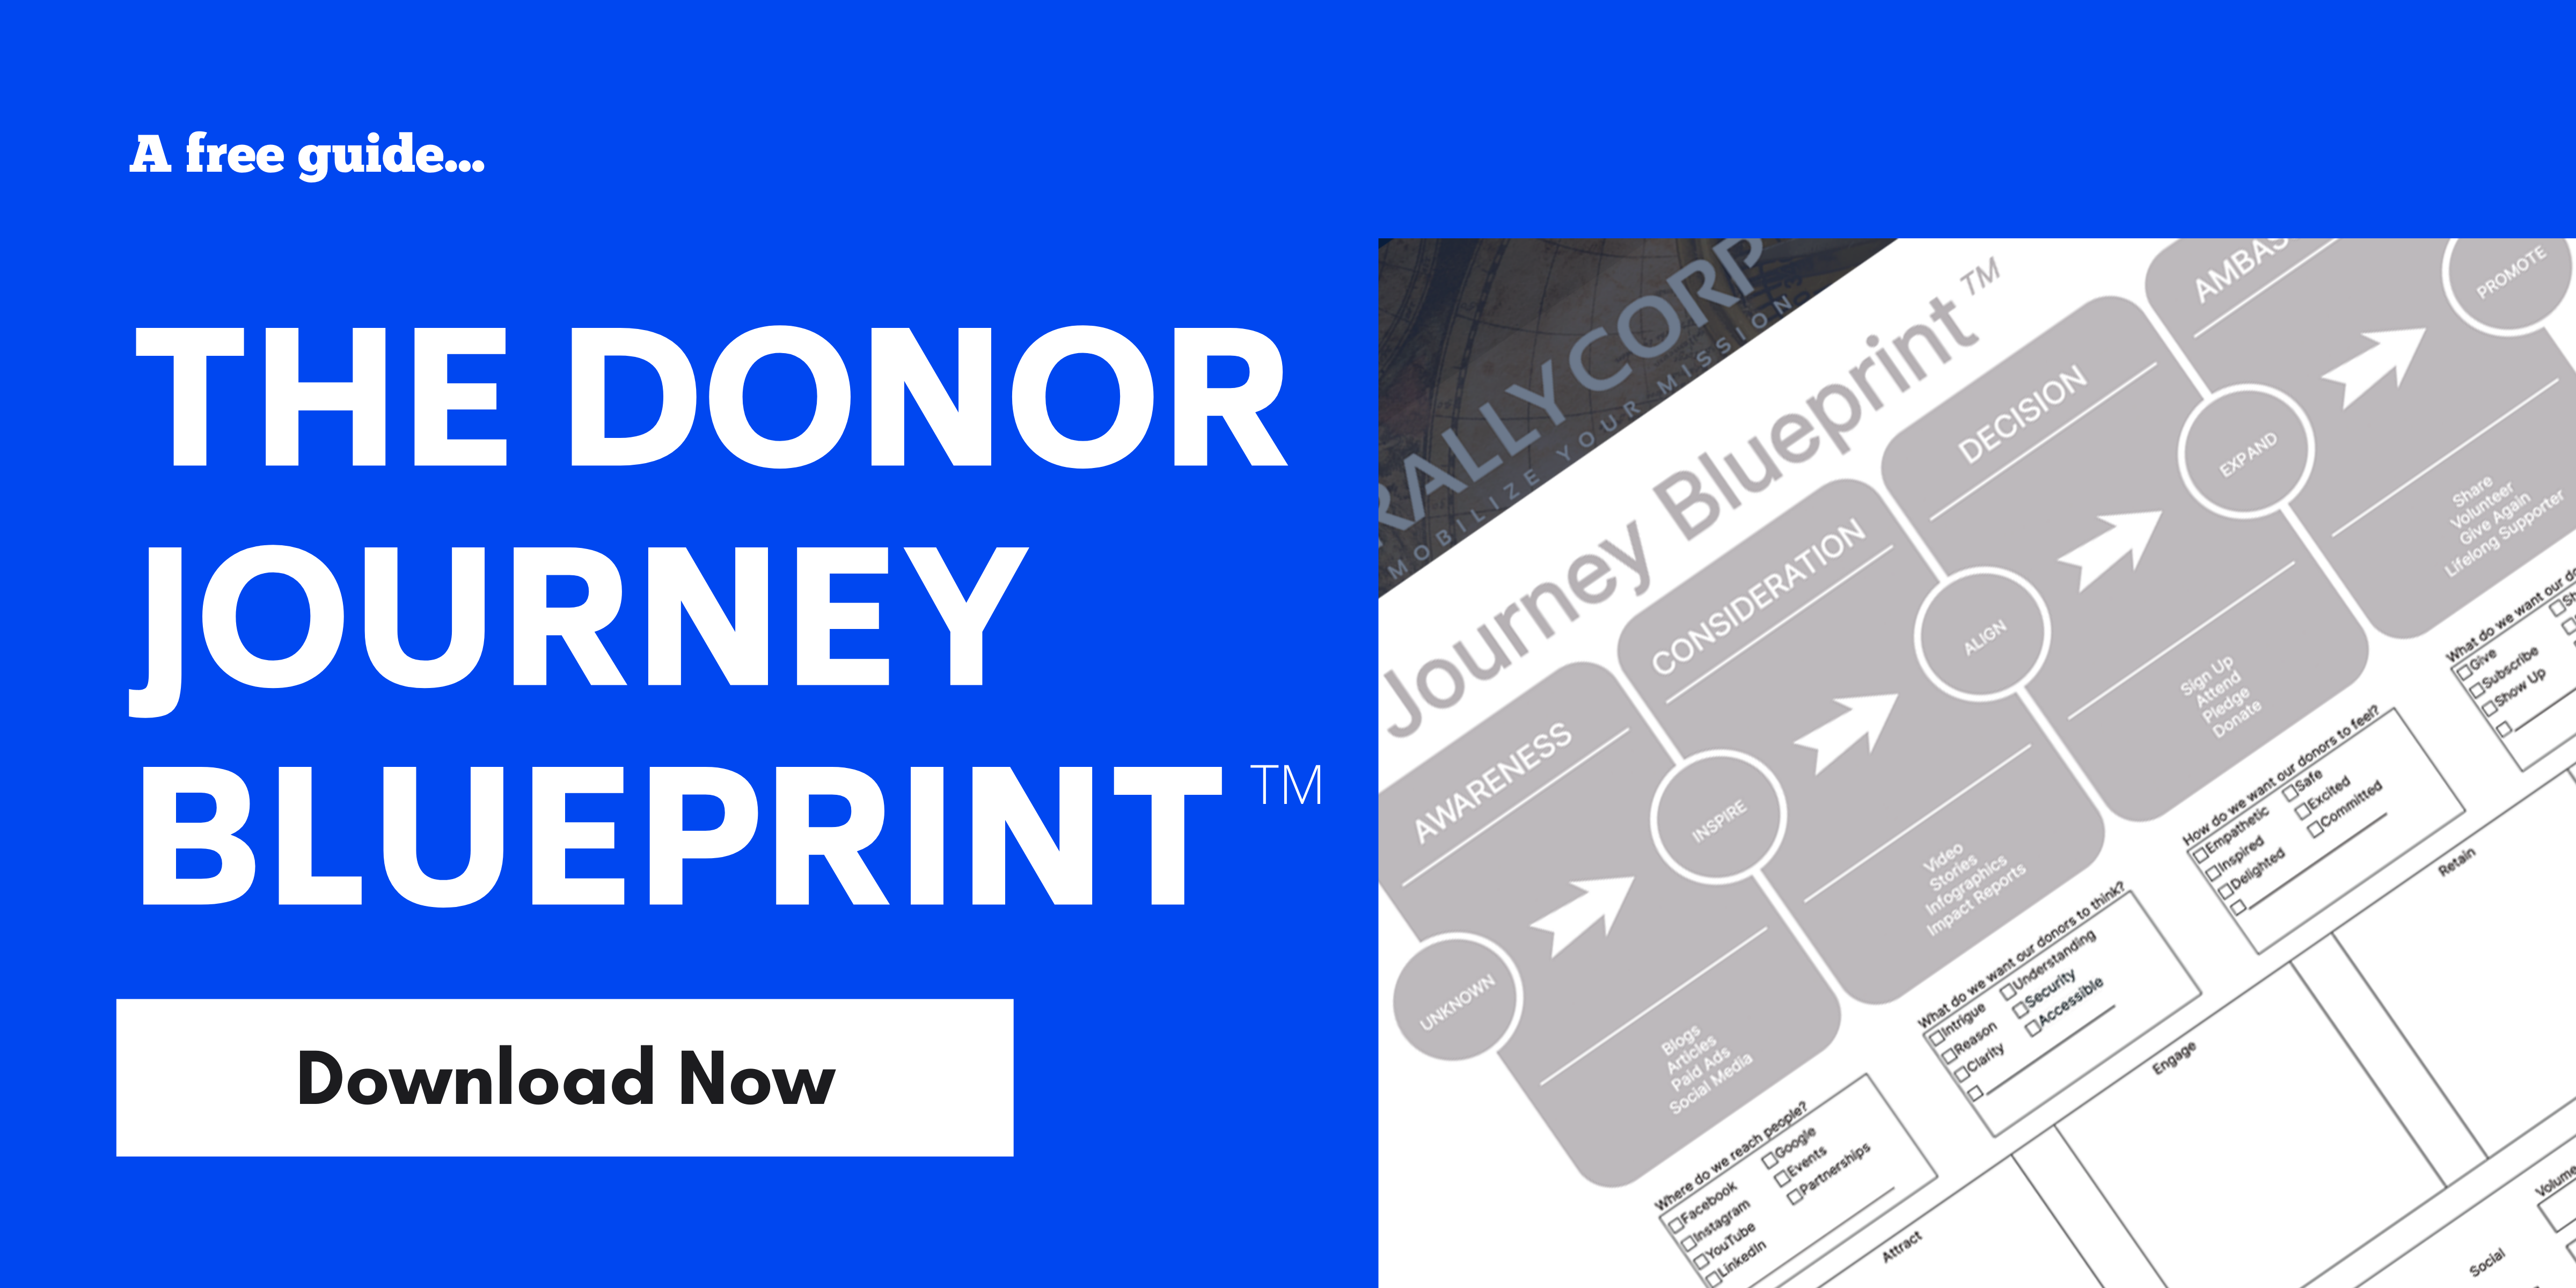 Rally-Corp-Donor-Journey-Blueprint